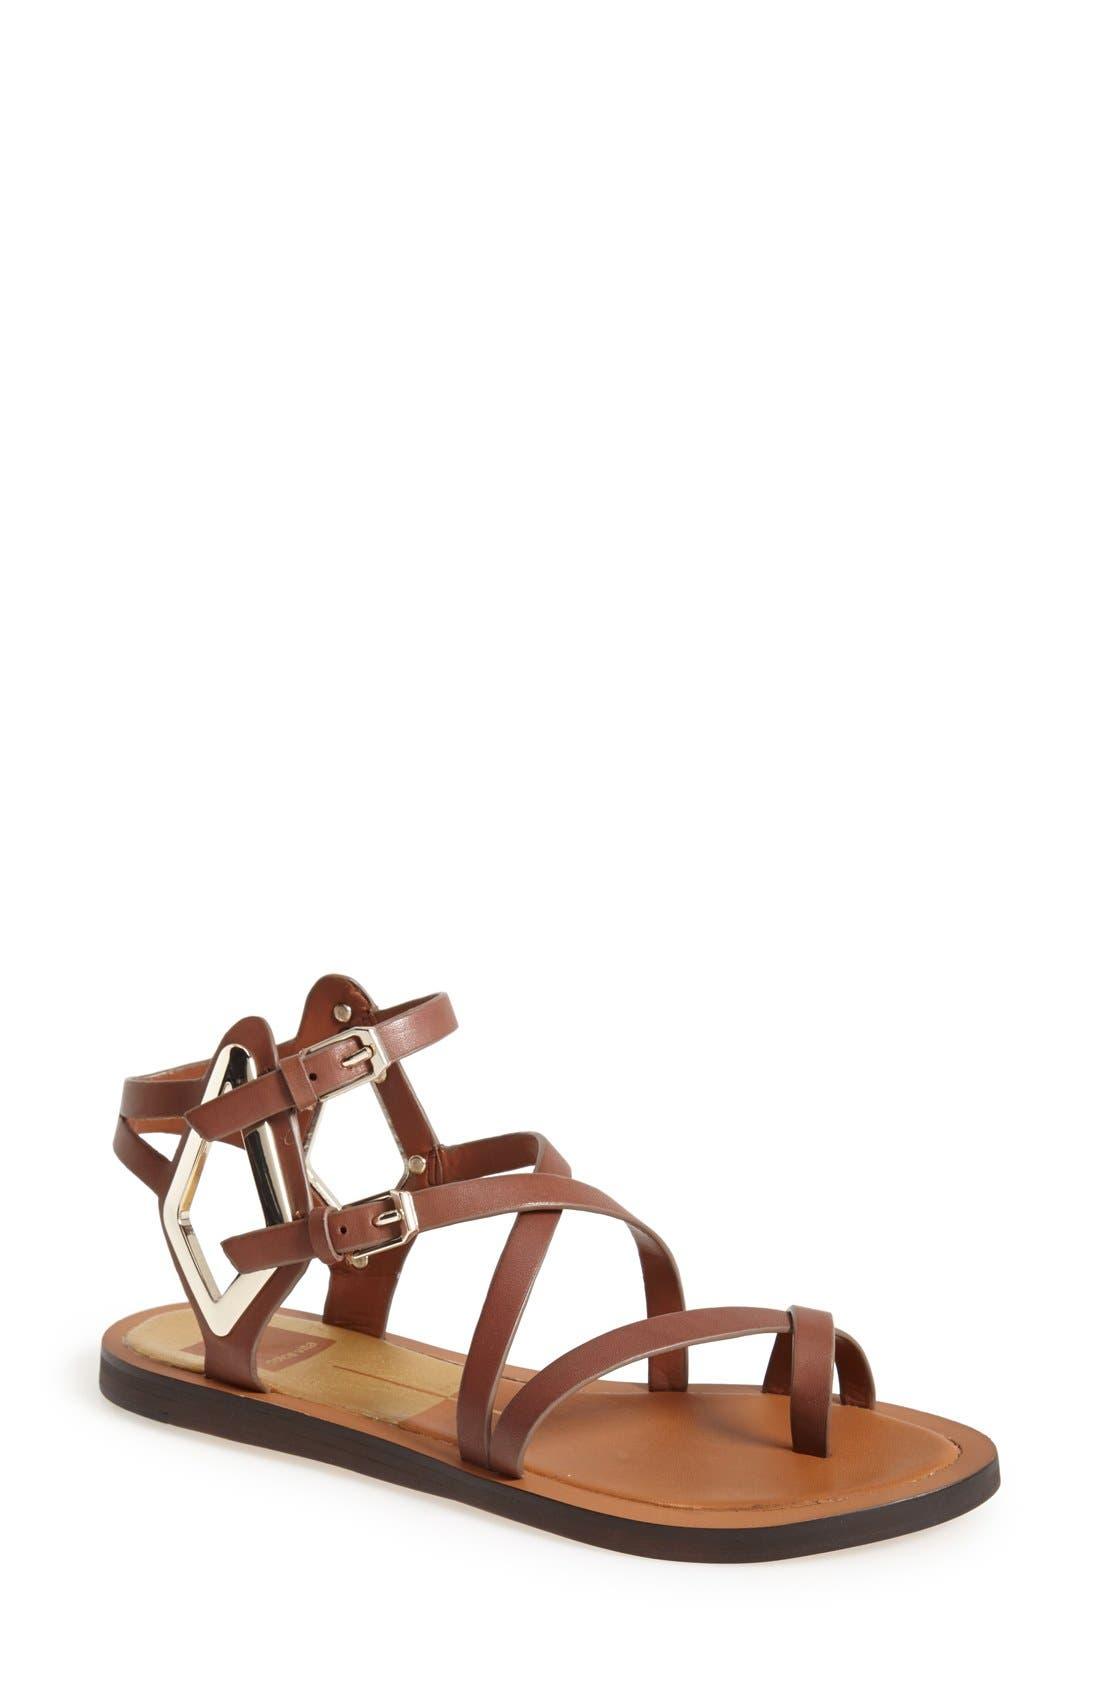 Main Image - Dolce Vita 'Ferrah' Flat Leather Sandal (Women)